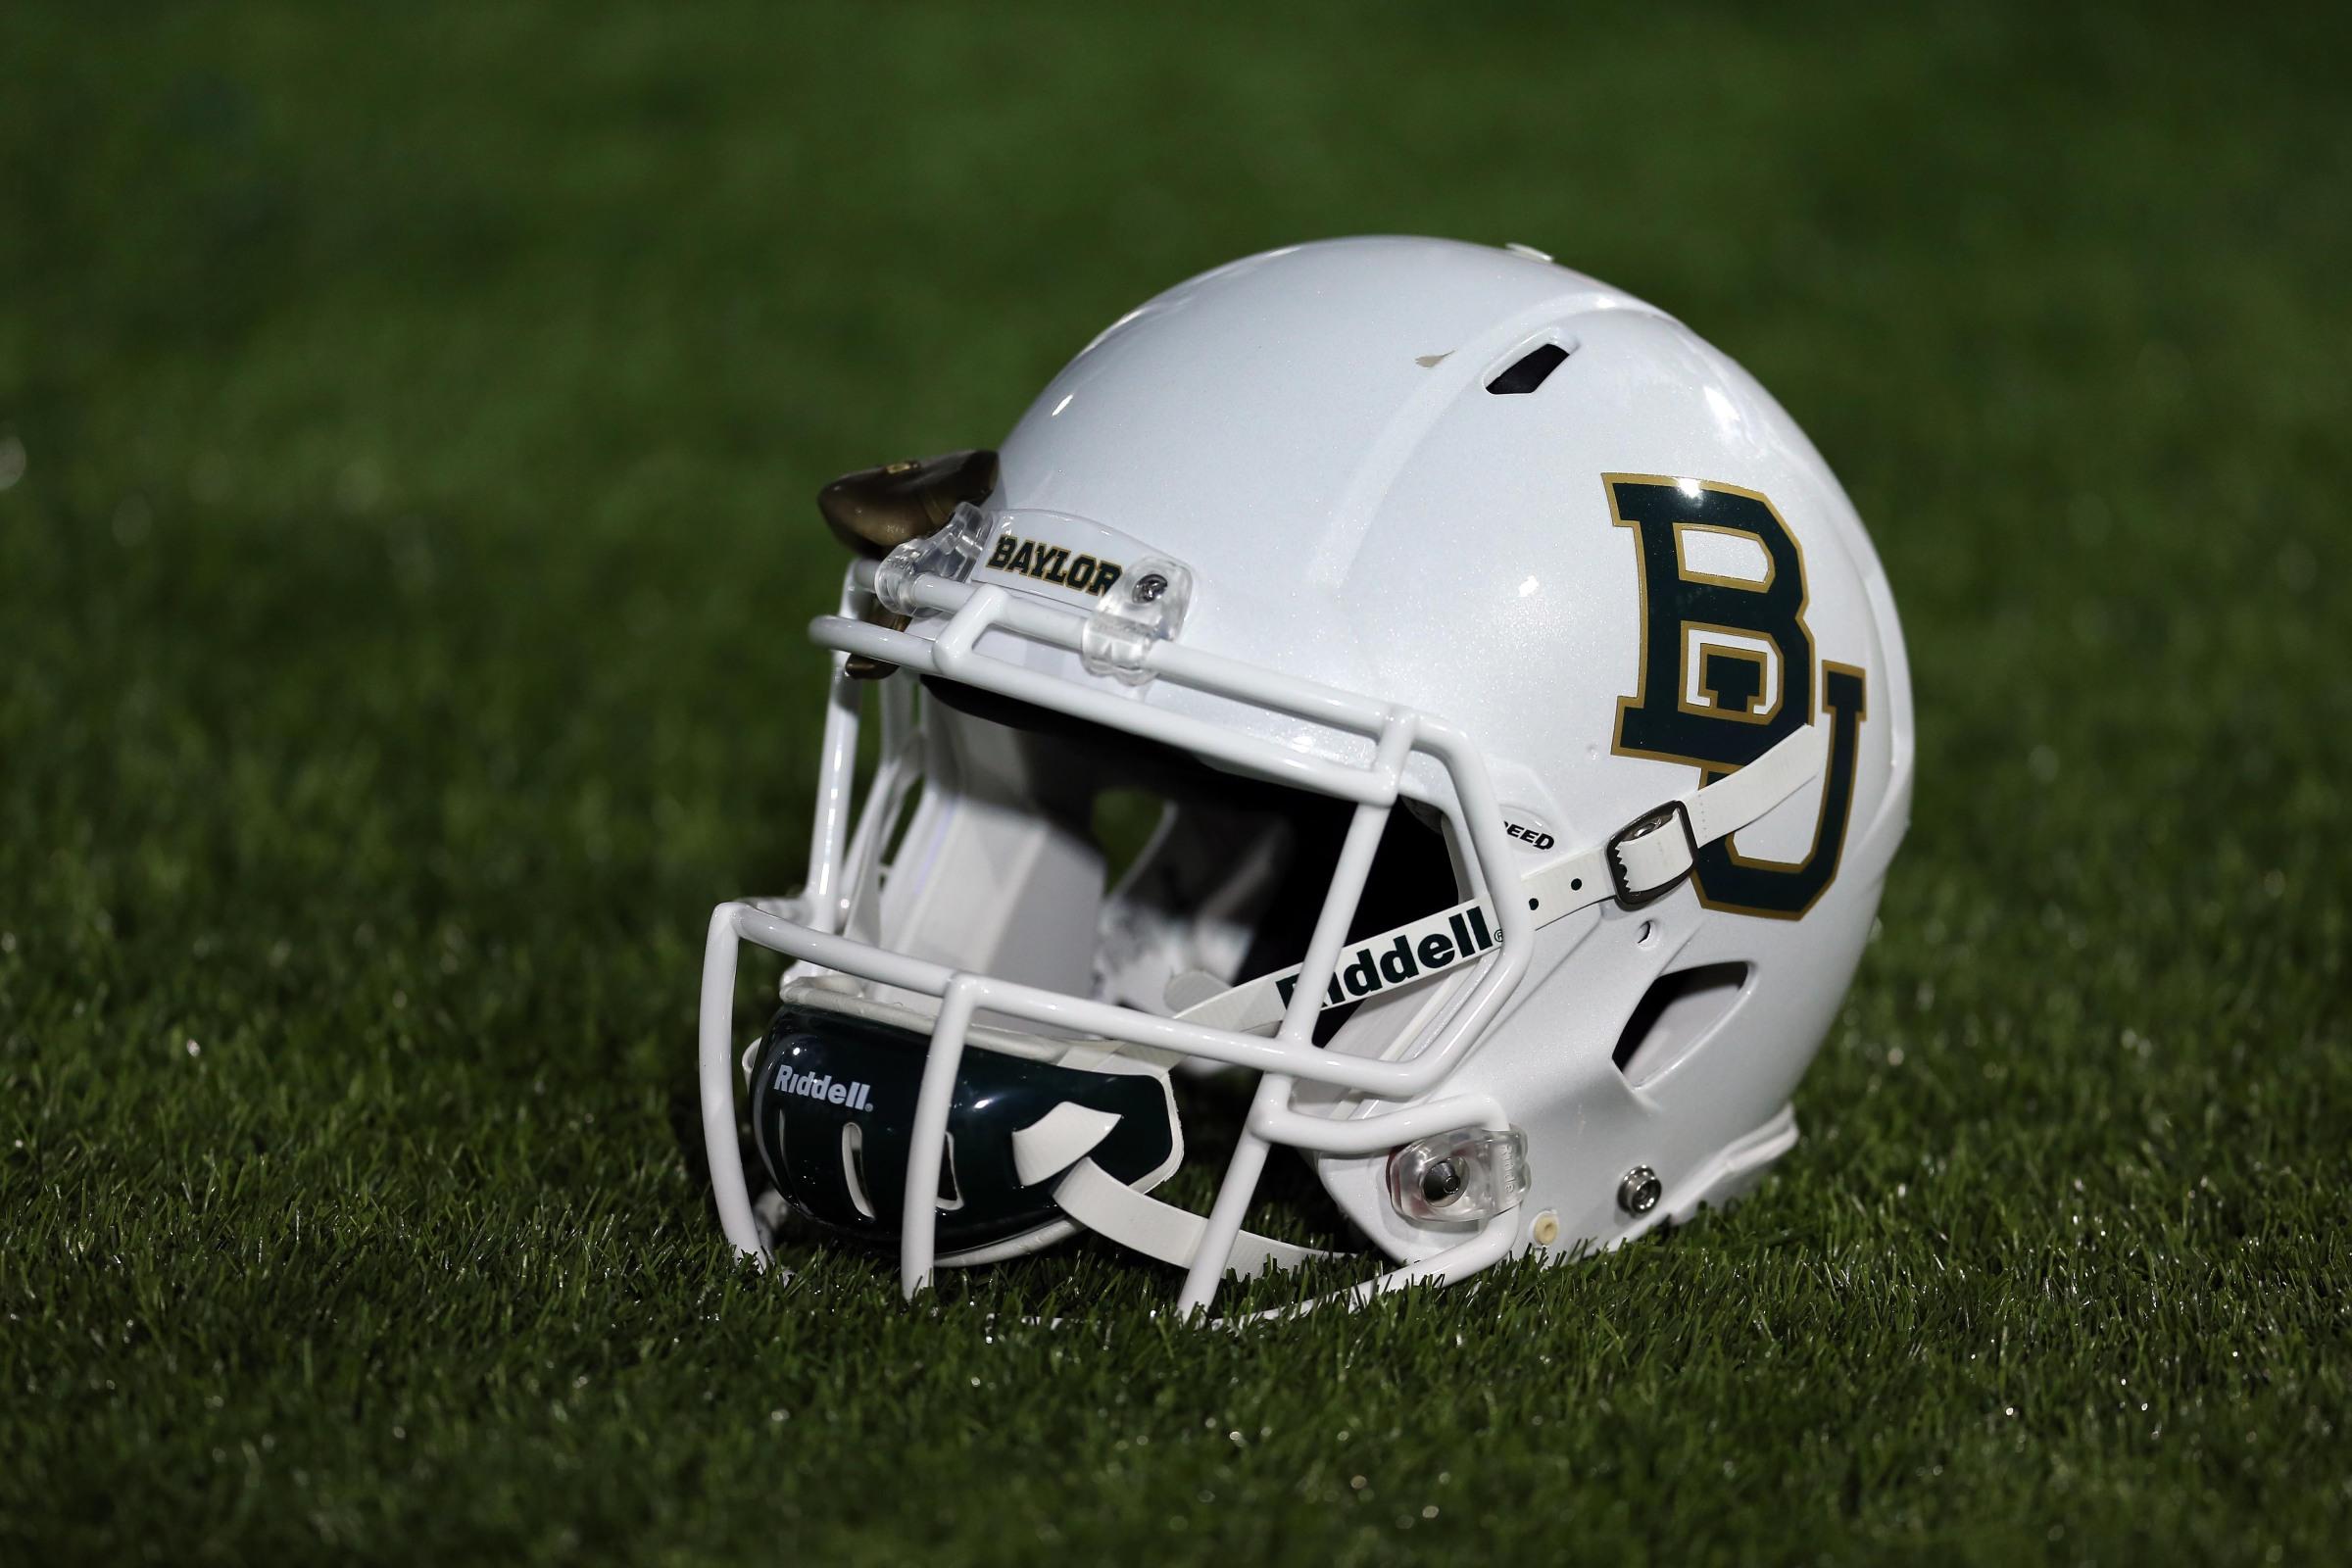 a baylor bears football helmet sits on some grass